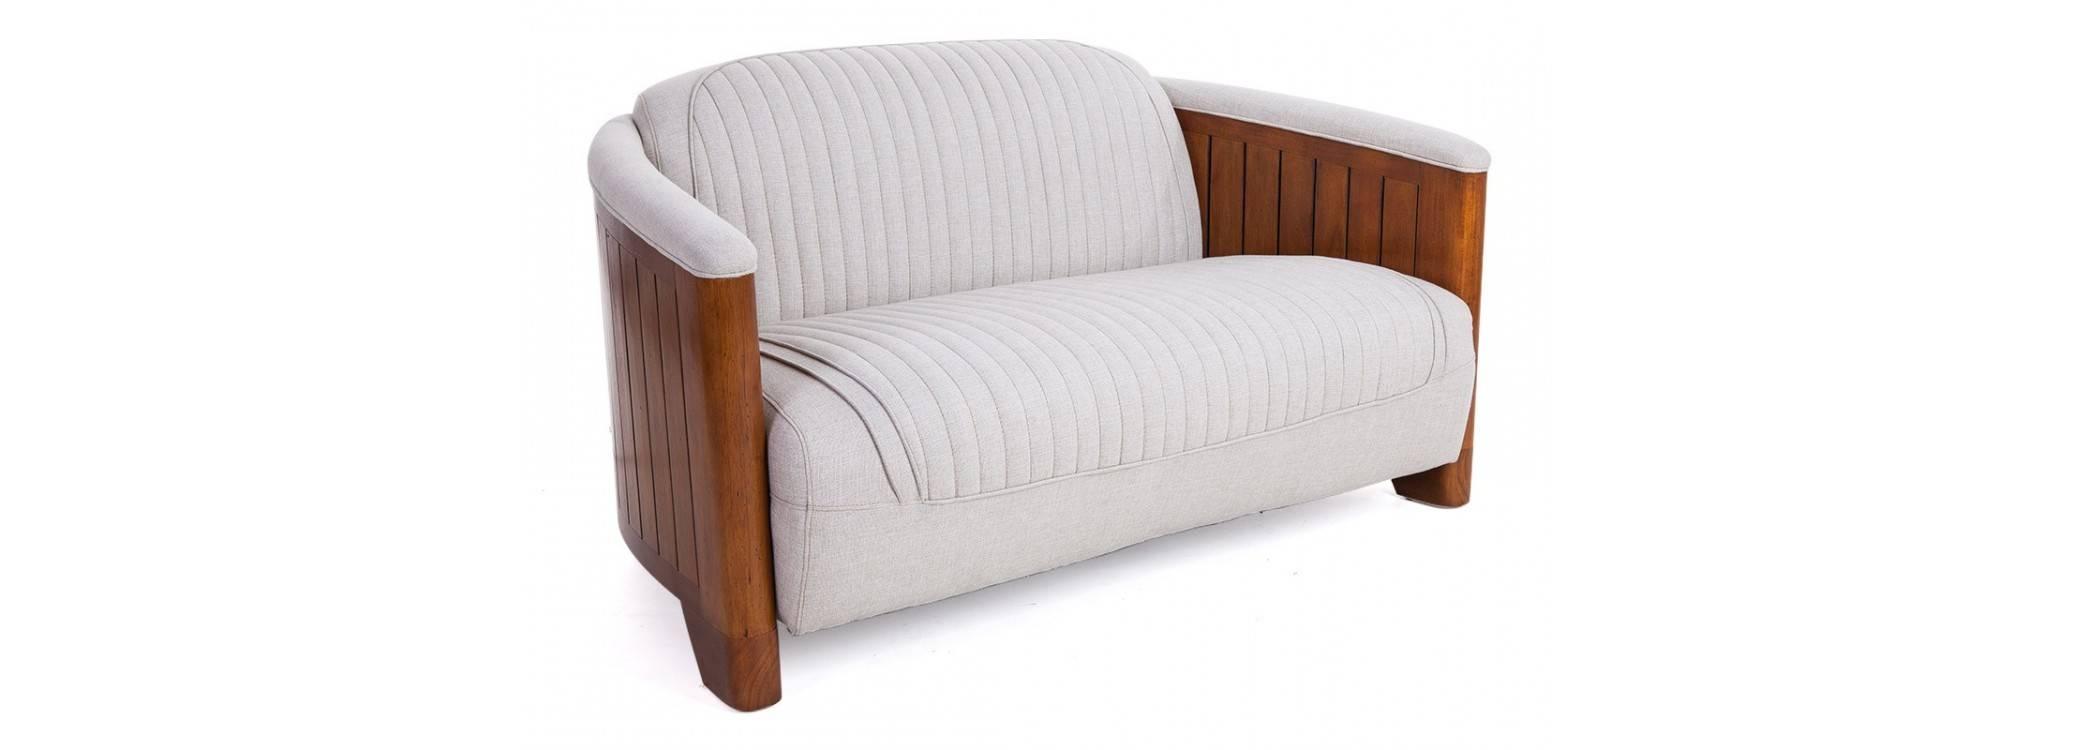 Canoë Sofa - Beige fabric